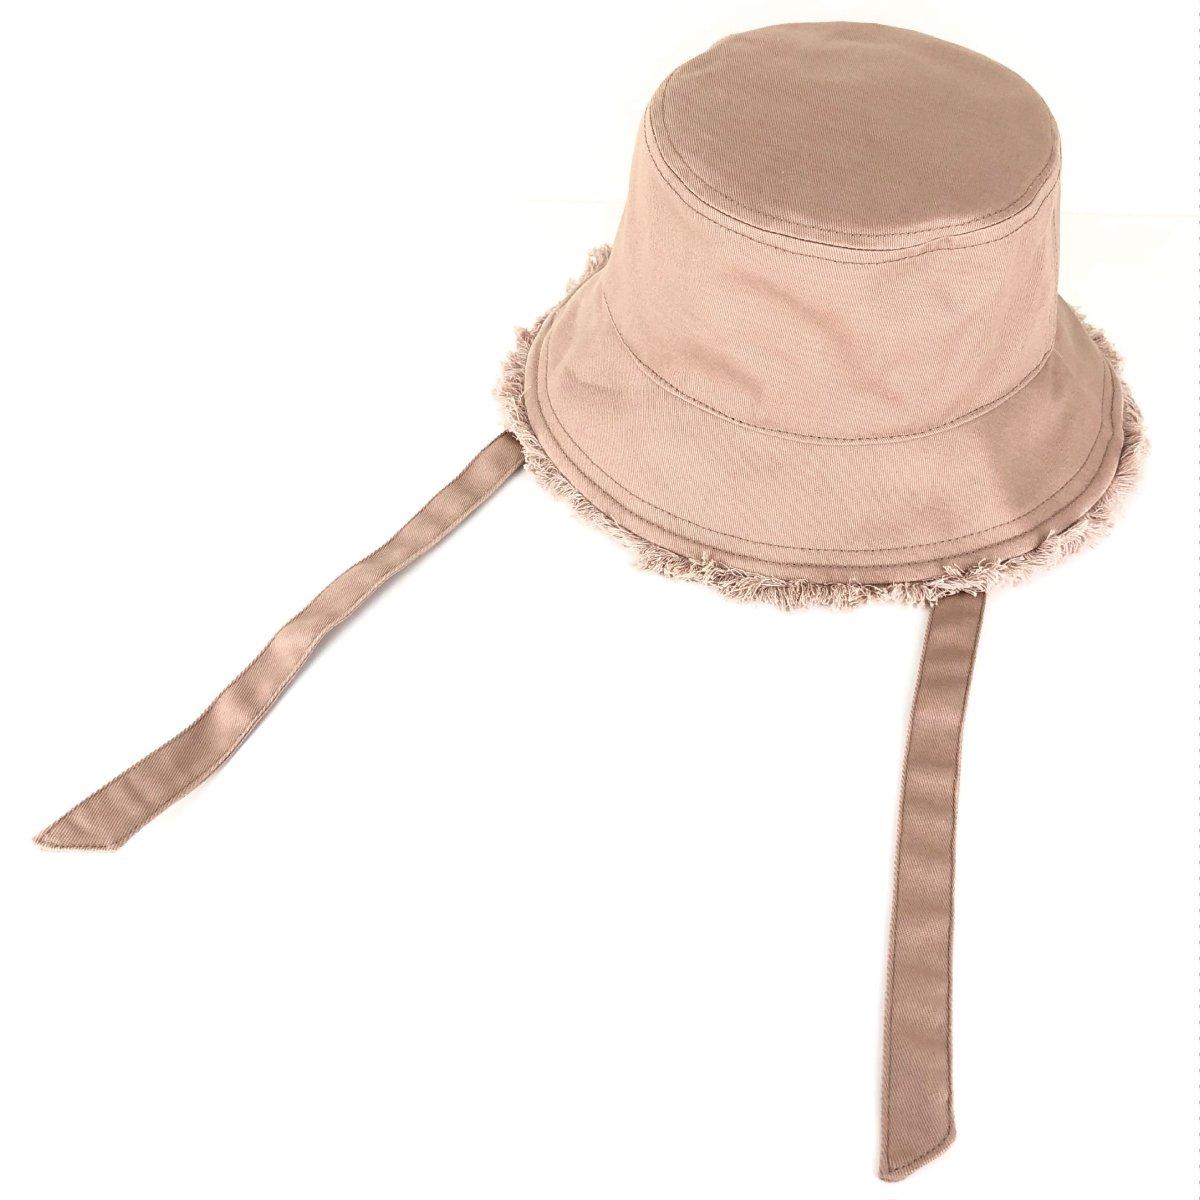 【KIDS】Kids Fringe Hat 詳細画像1